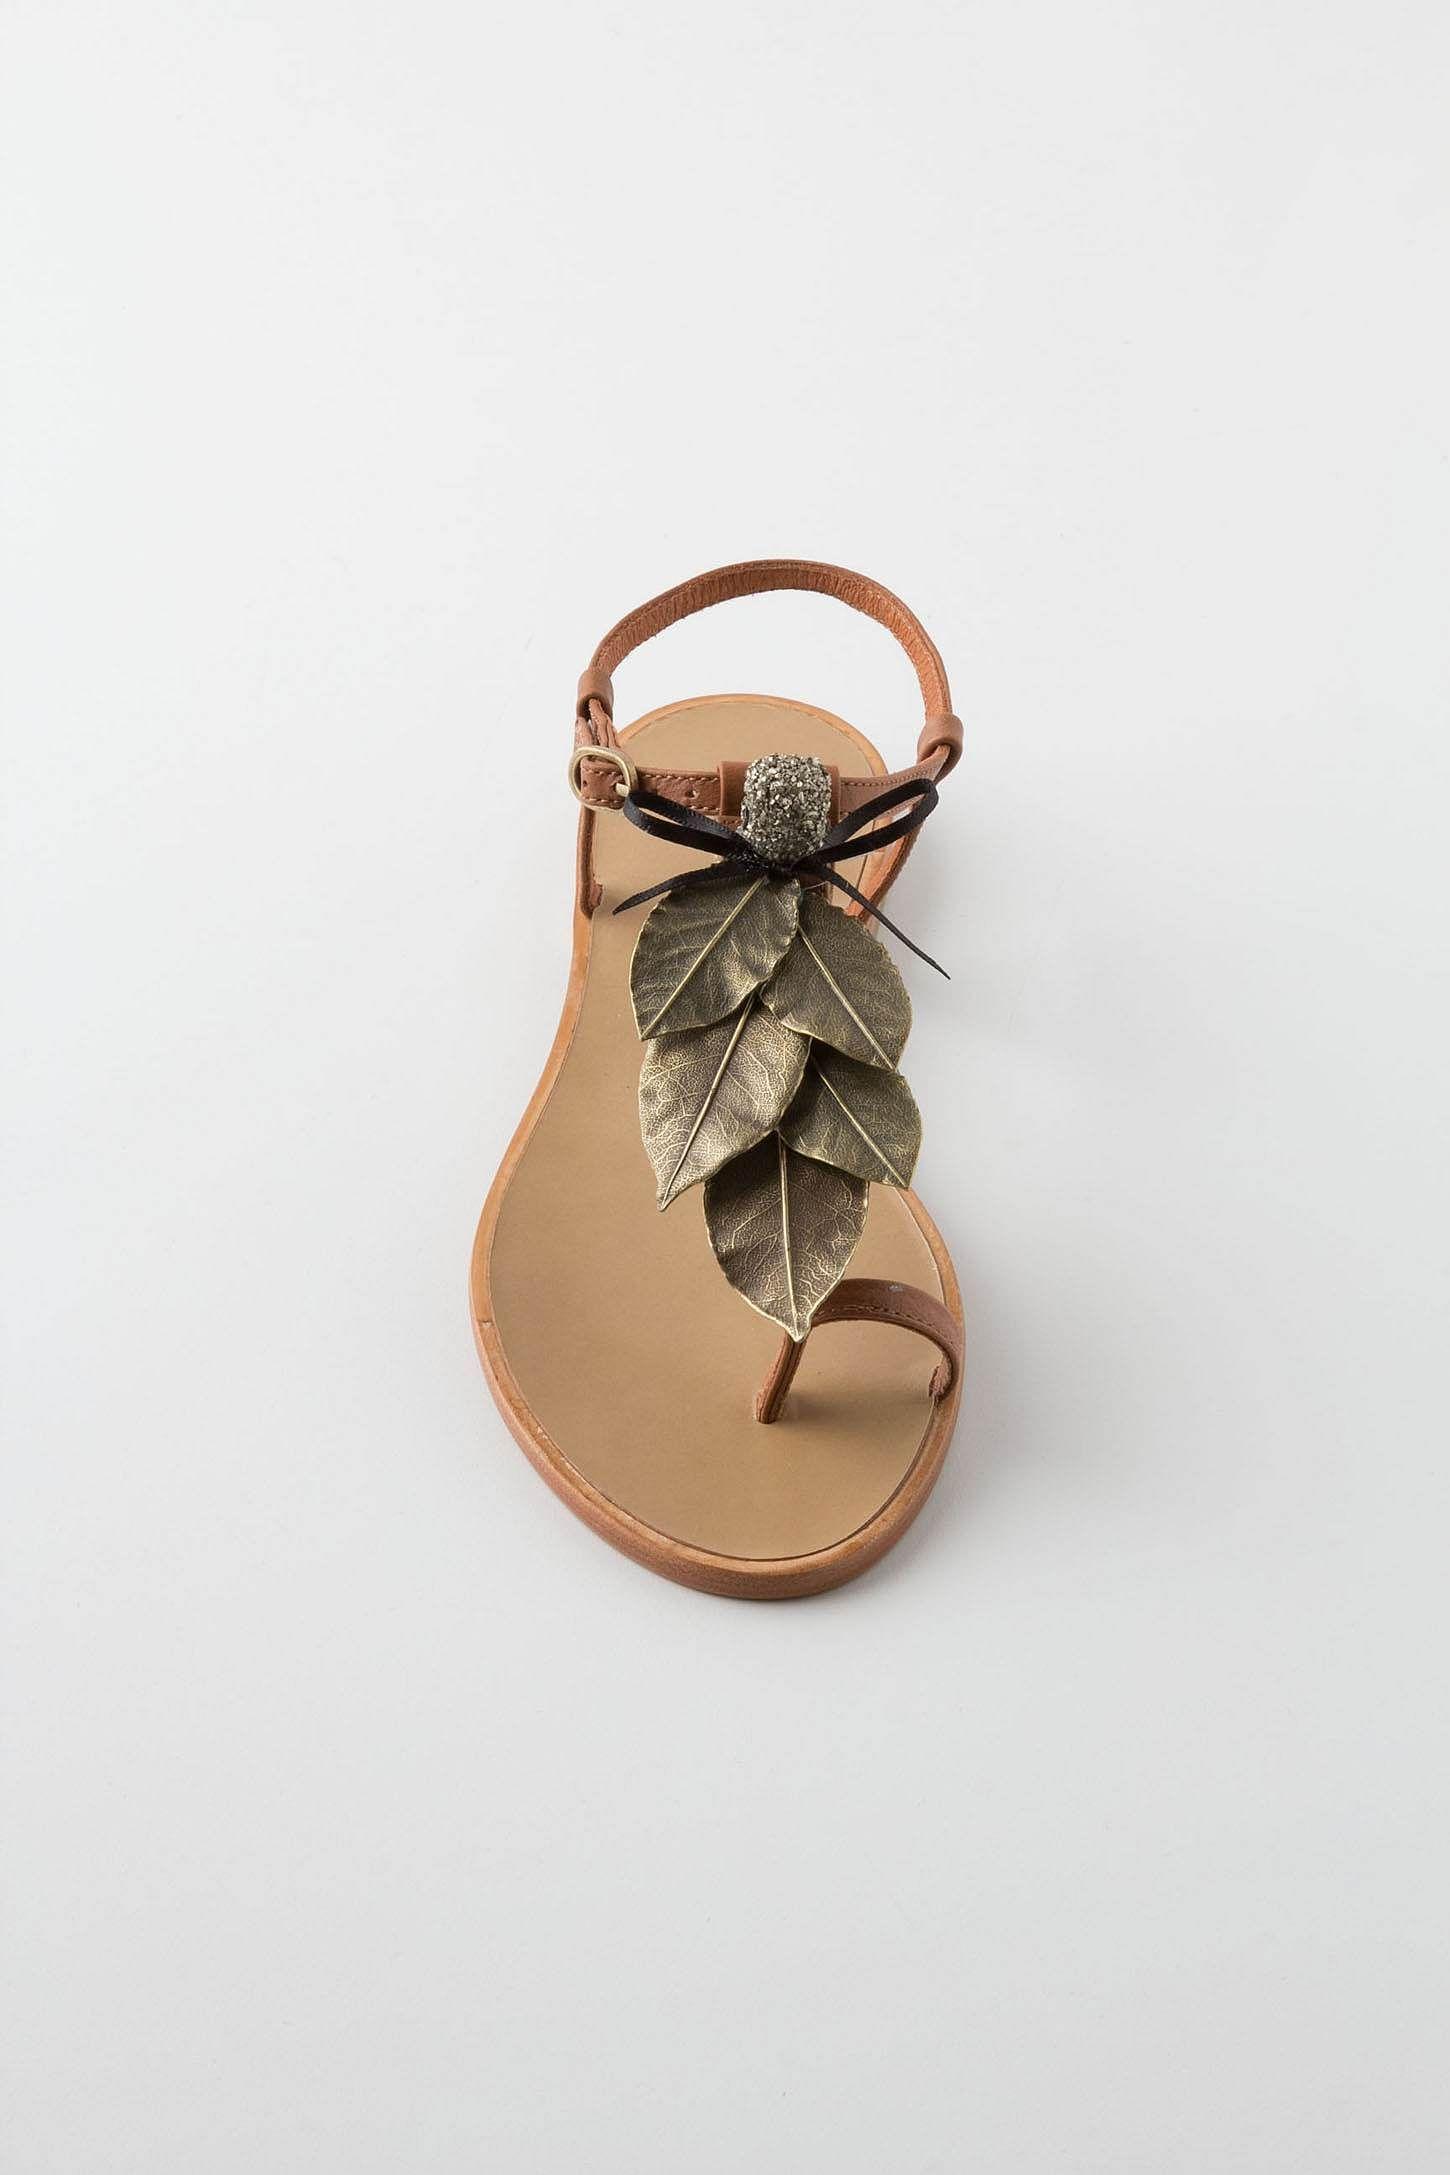 8587cb0f7ec Glasir's Grove Sandals Shoe Dazzle, Sock Shoes, Shoe Boots, Leather  Sandals, Flat